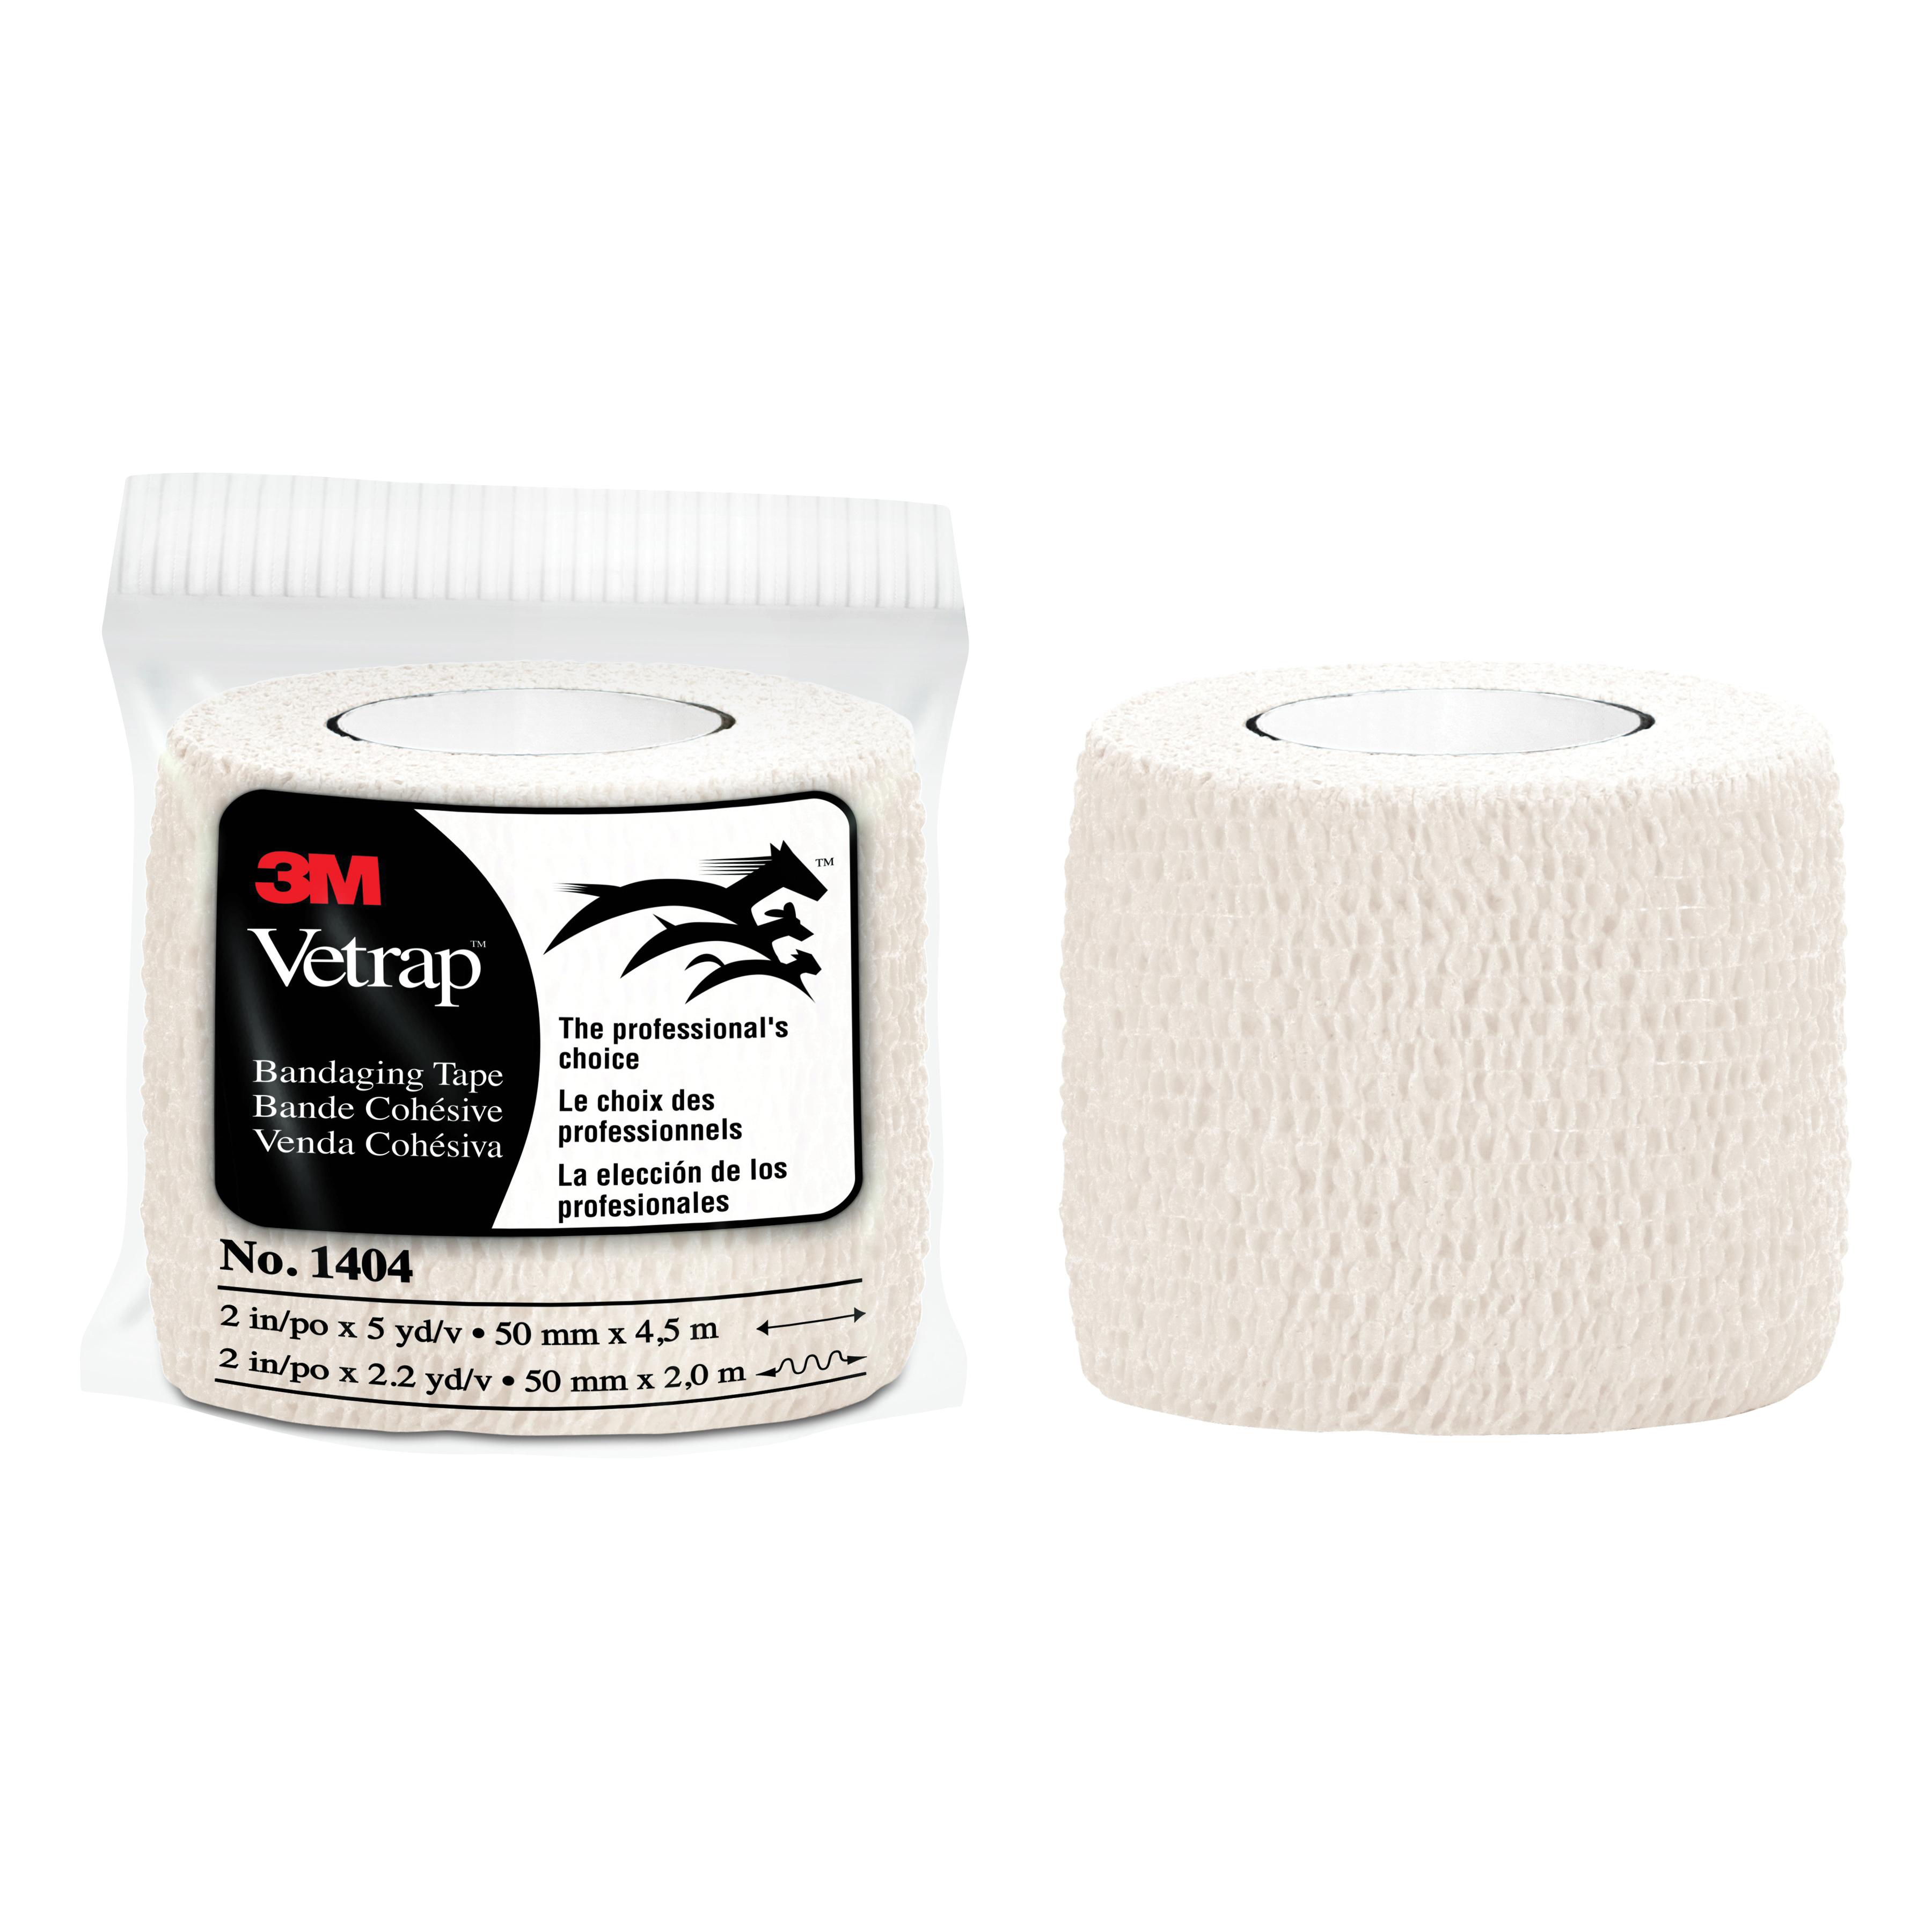 3M™ Vetrap™ 051115-04859 Stretched Bandaging Tape, 5 yd L x 2 in W, White, Vetrap™